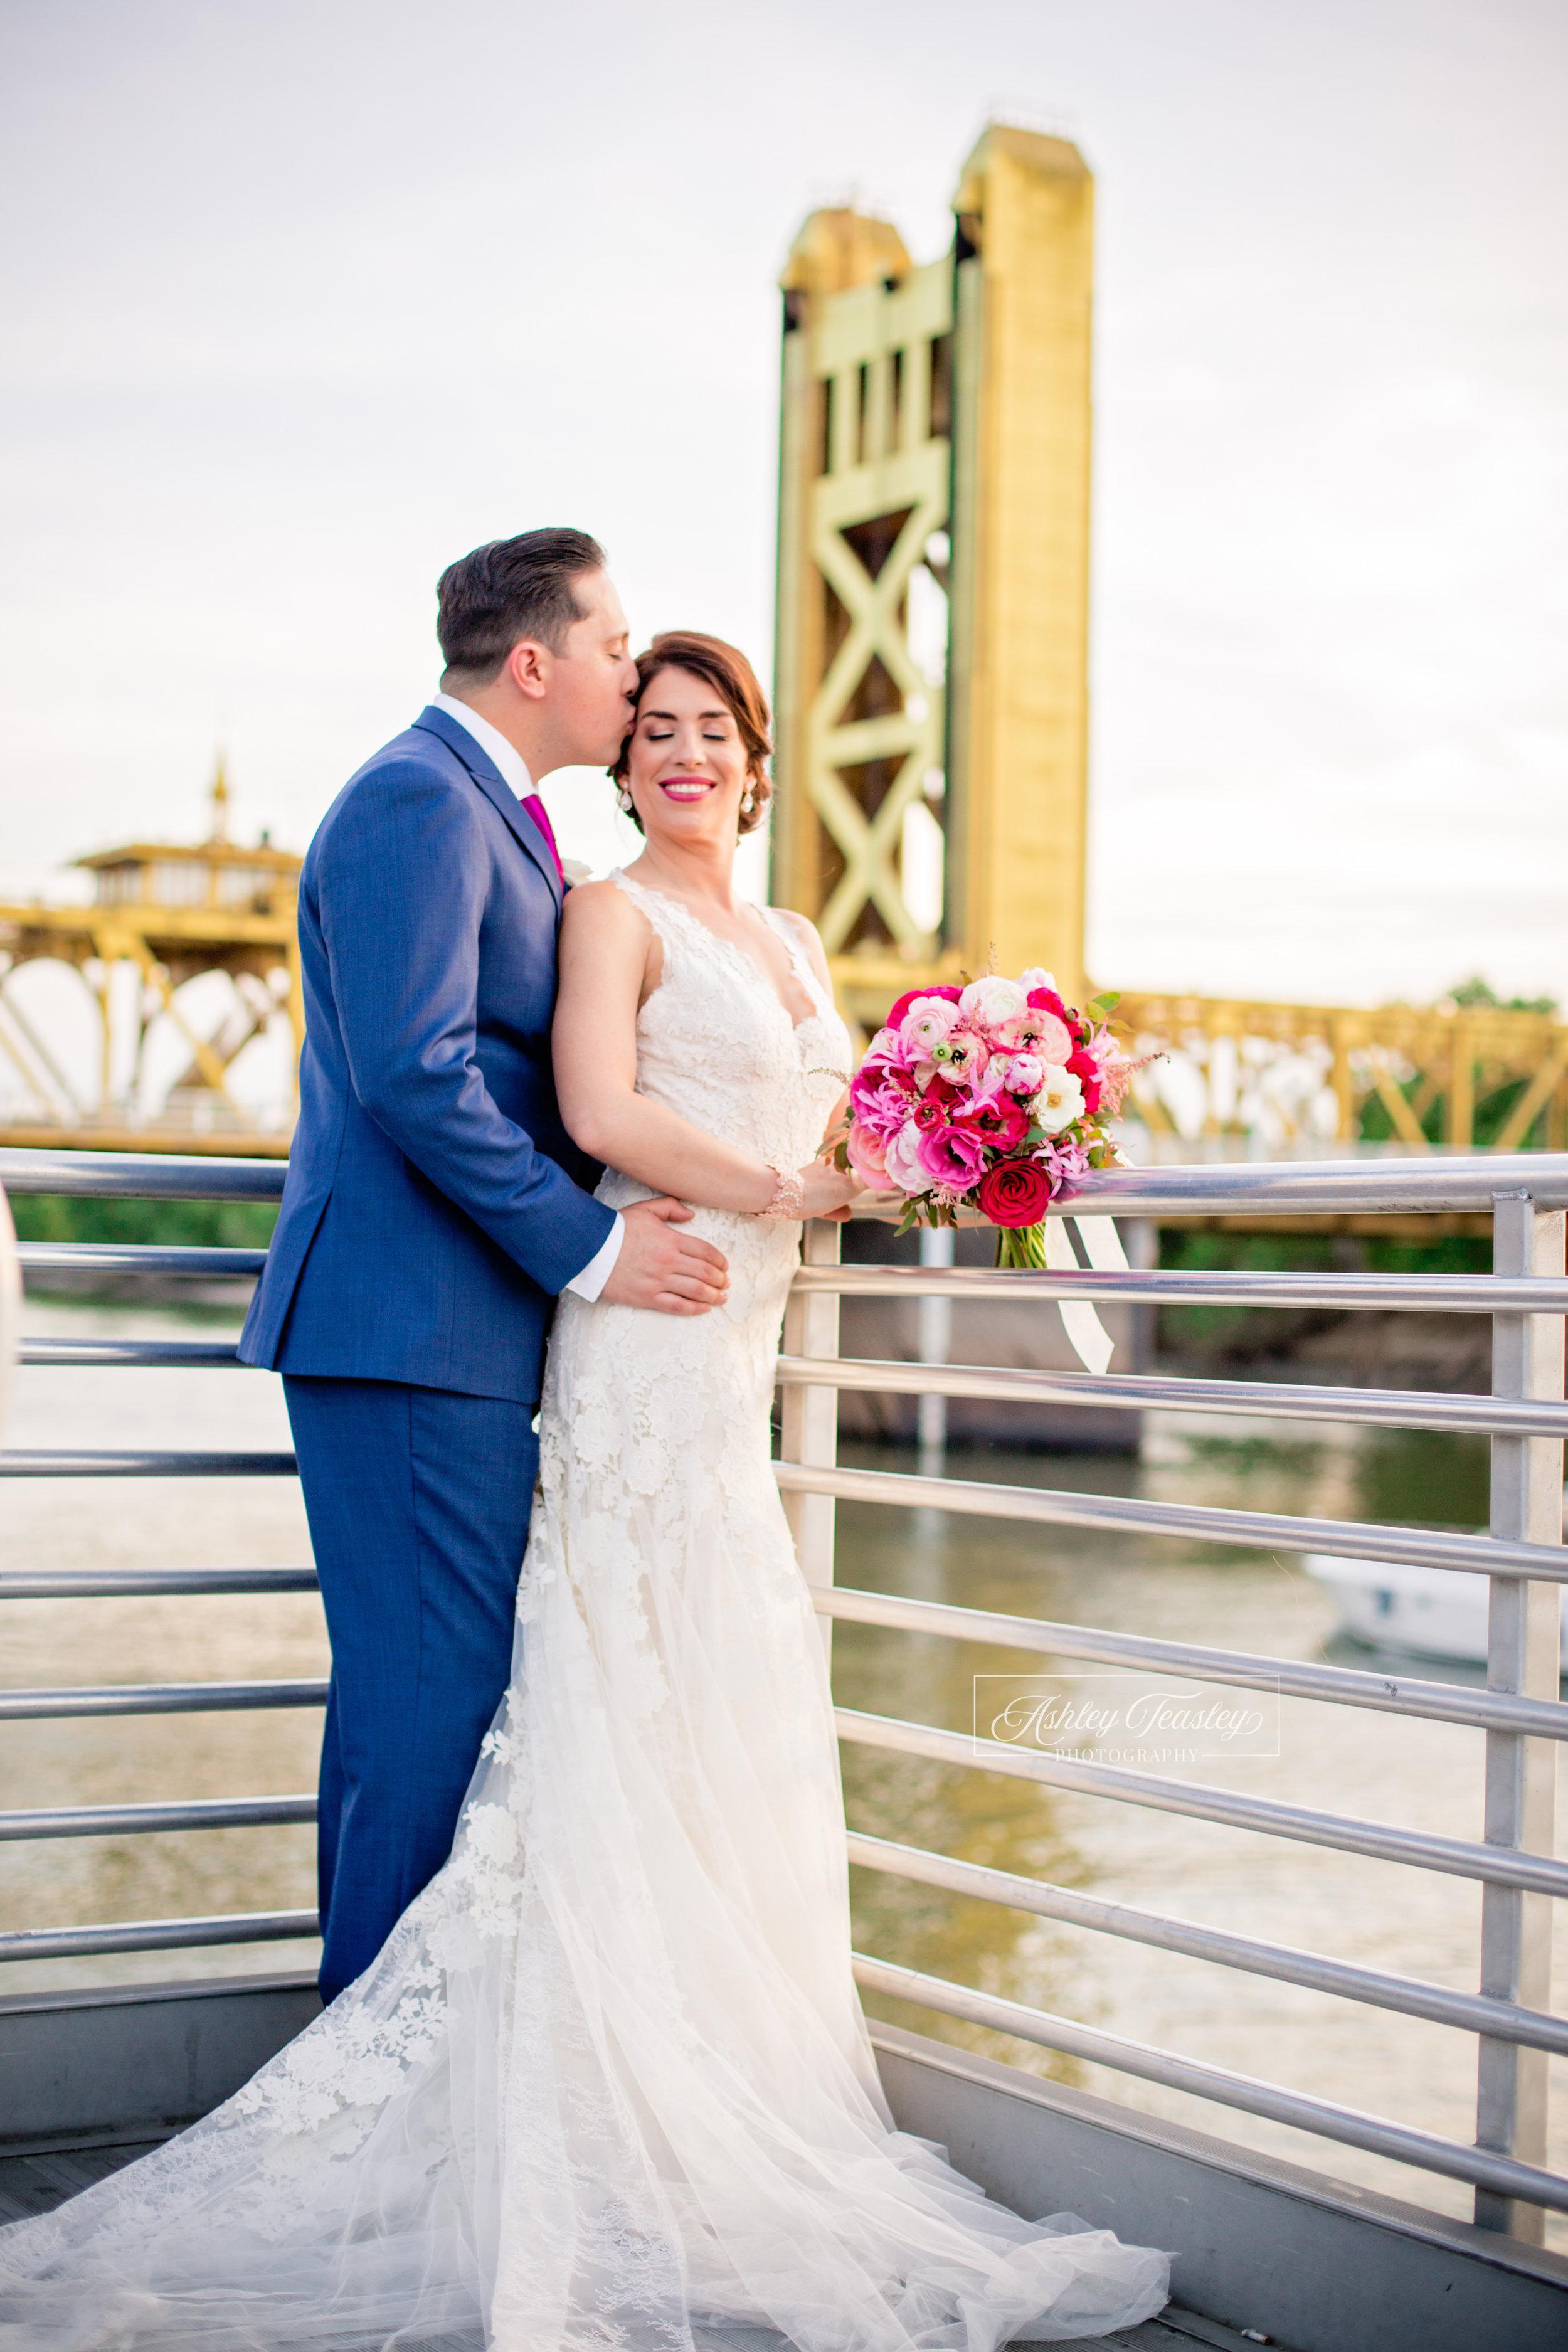 Tarrah & Francisco - The Kimpton Sawyer Hotel - The Firehouse Old Sac - Sacramento Wedding Photographer - Ashley Teasley Photography (23 of 118).jpg